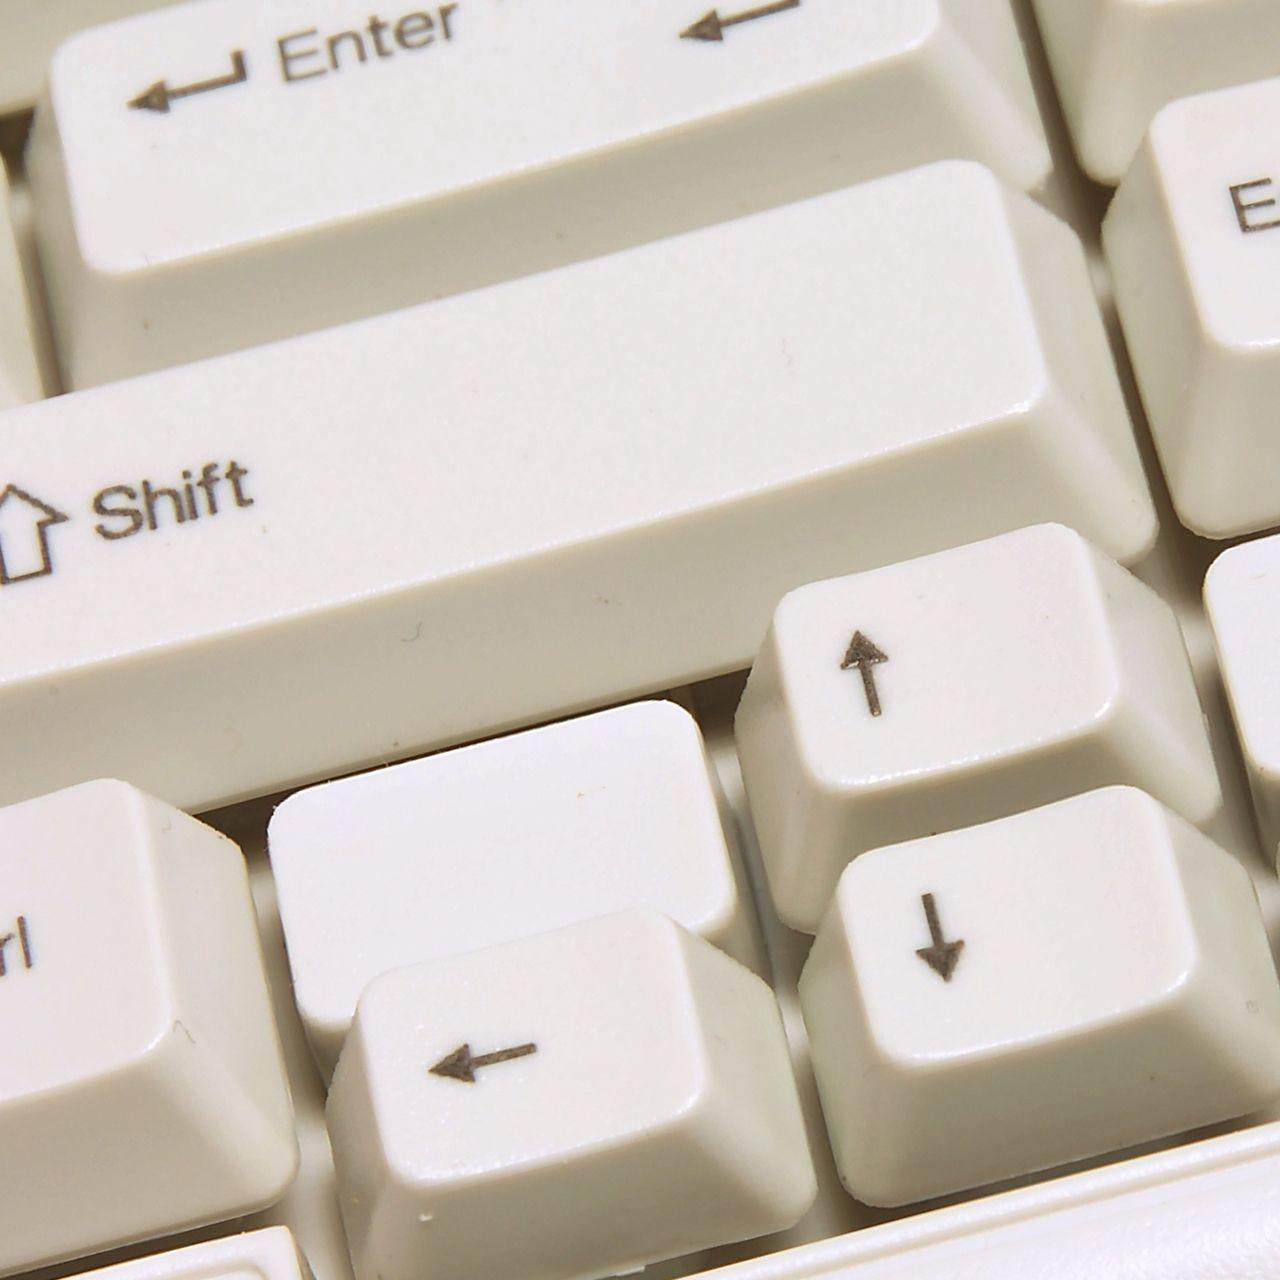 bakker-elkhuizen q board aquarius white toetsenbord bedraad ERKAAQU36 Detail